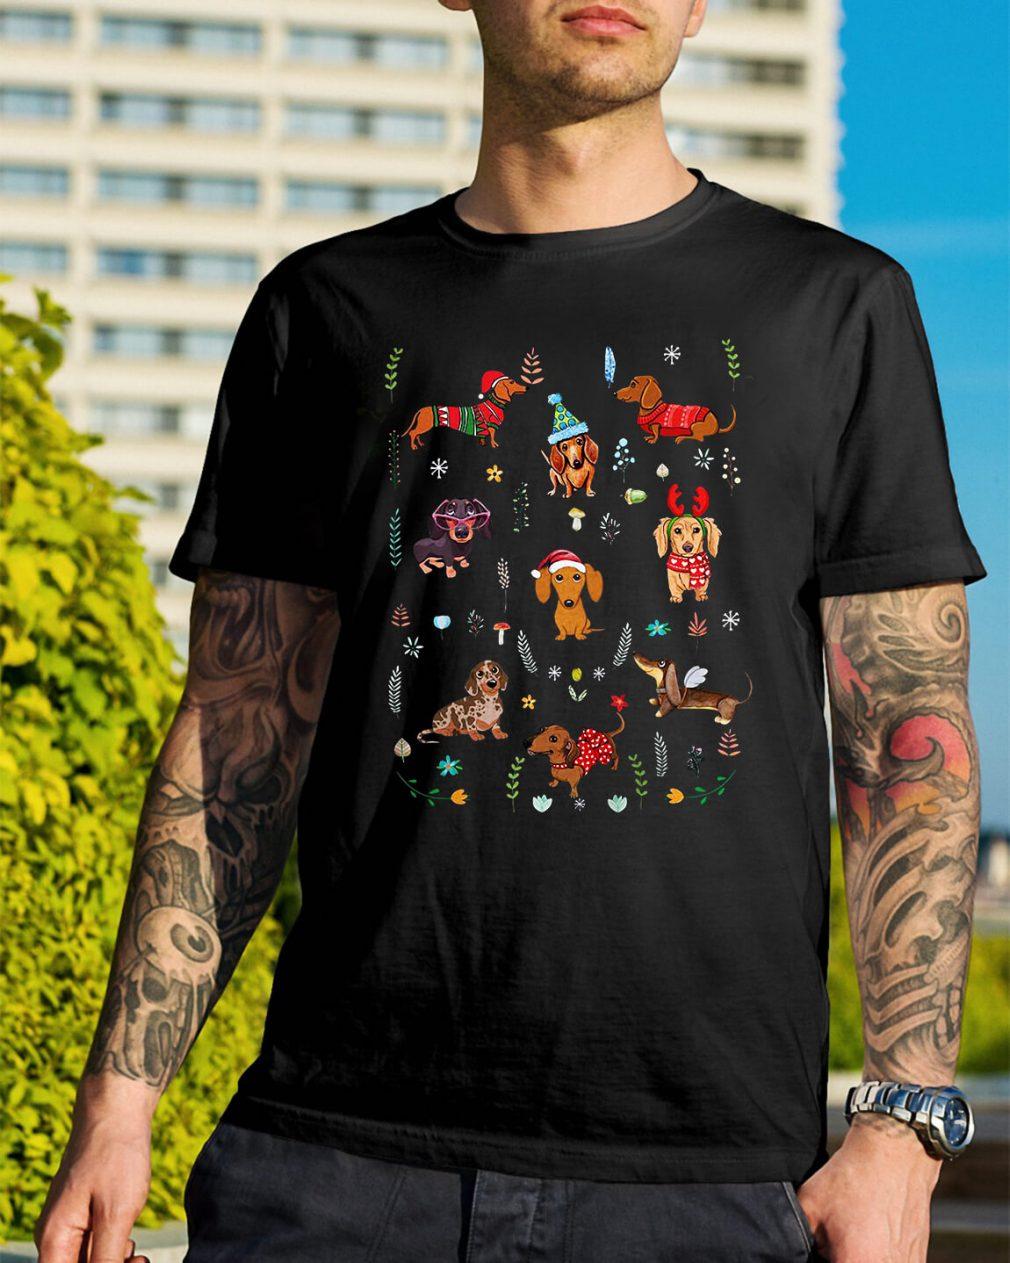 Doxie fabrics Dachshunds dog Christmas Guys Shirt